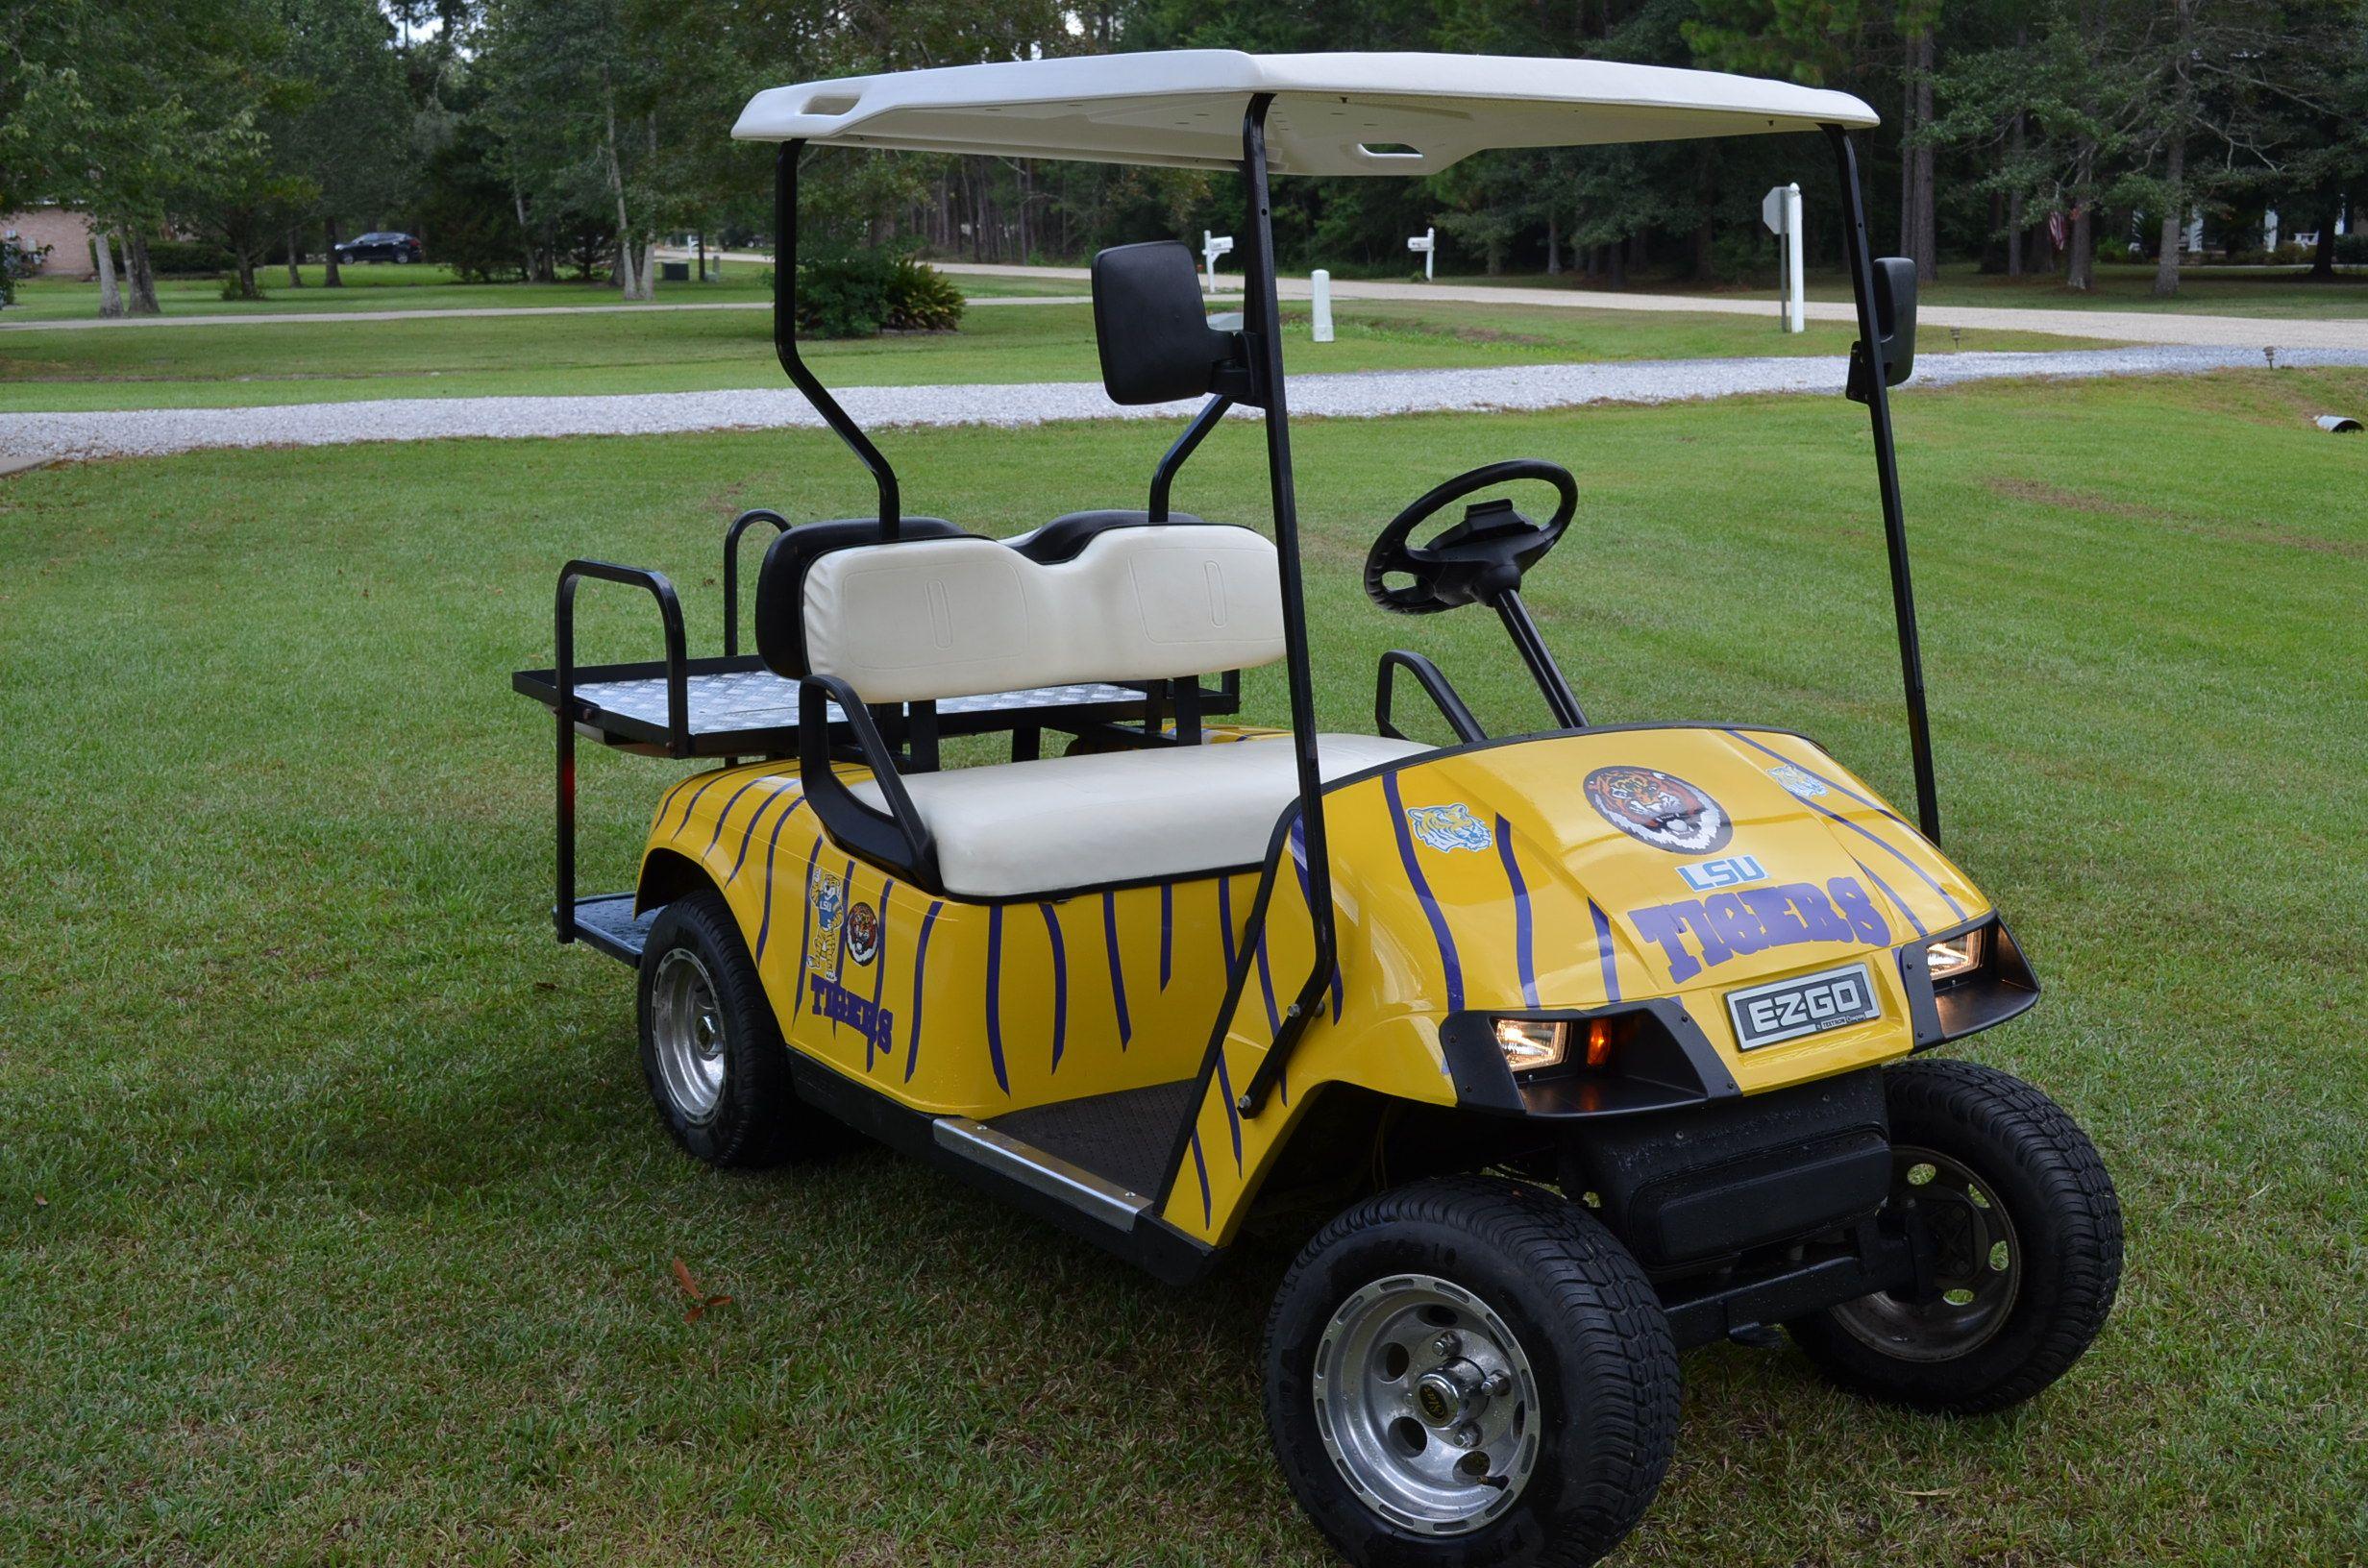 Battery Powered Golf Carts Ez Go Seat on ez go golf carts chargers, ez golf cart batteries, ez go powerwise battery charger, 36 volt battery, forklift battery, trojan t-105 6v battery, ez go bike battery, ez go panama city,